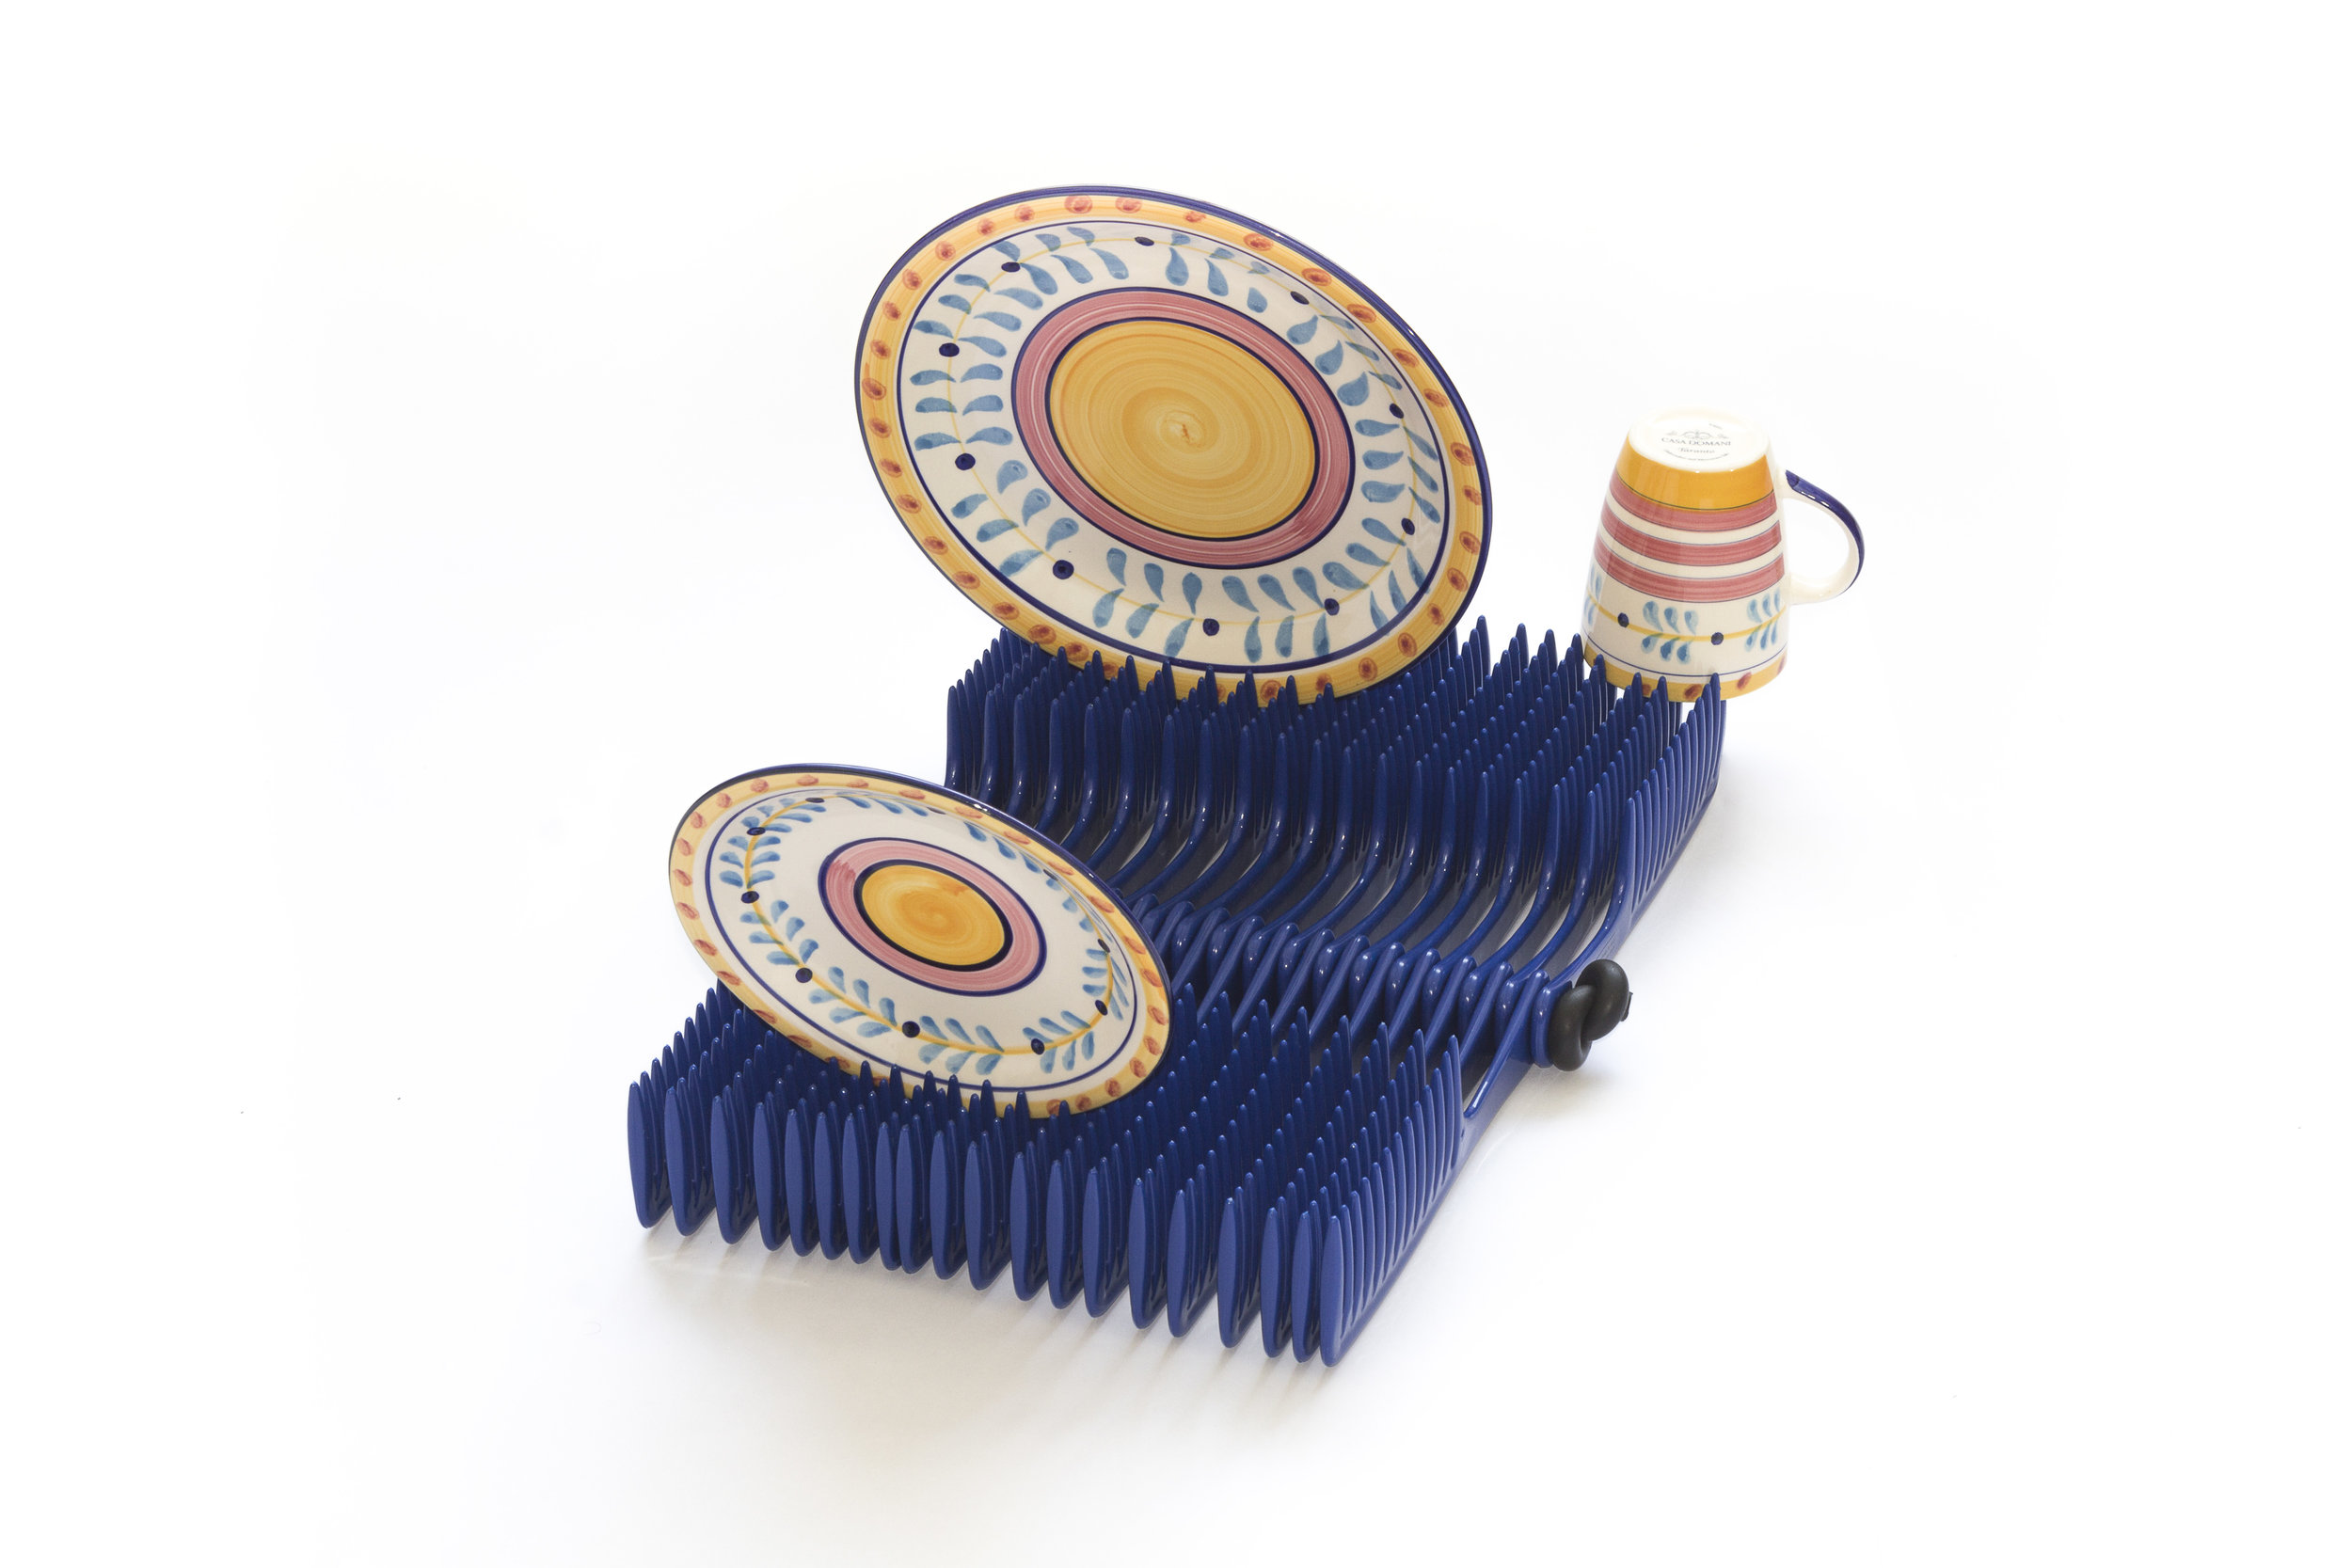 Pentz - escorredor de pratos duplo - azul - Design Eduardo Borém - IMG_0155-Edit.jpg